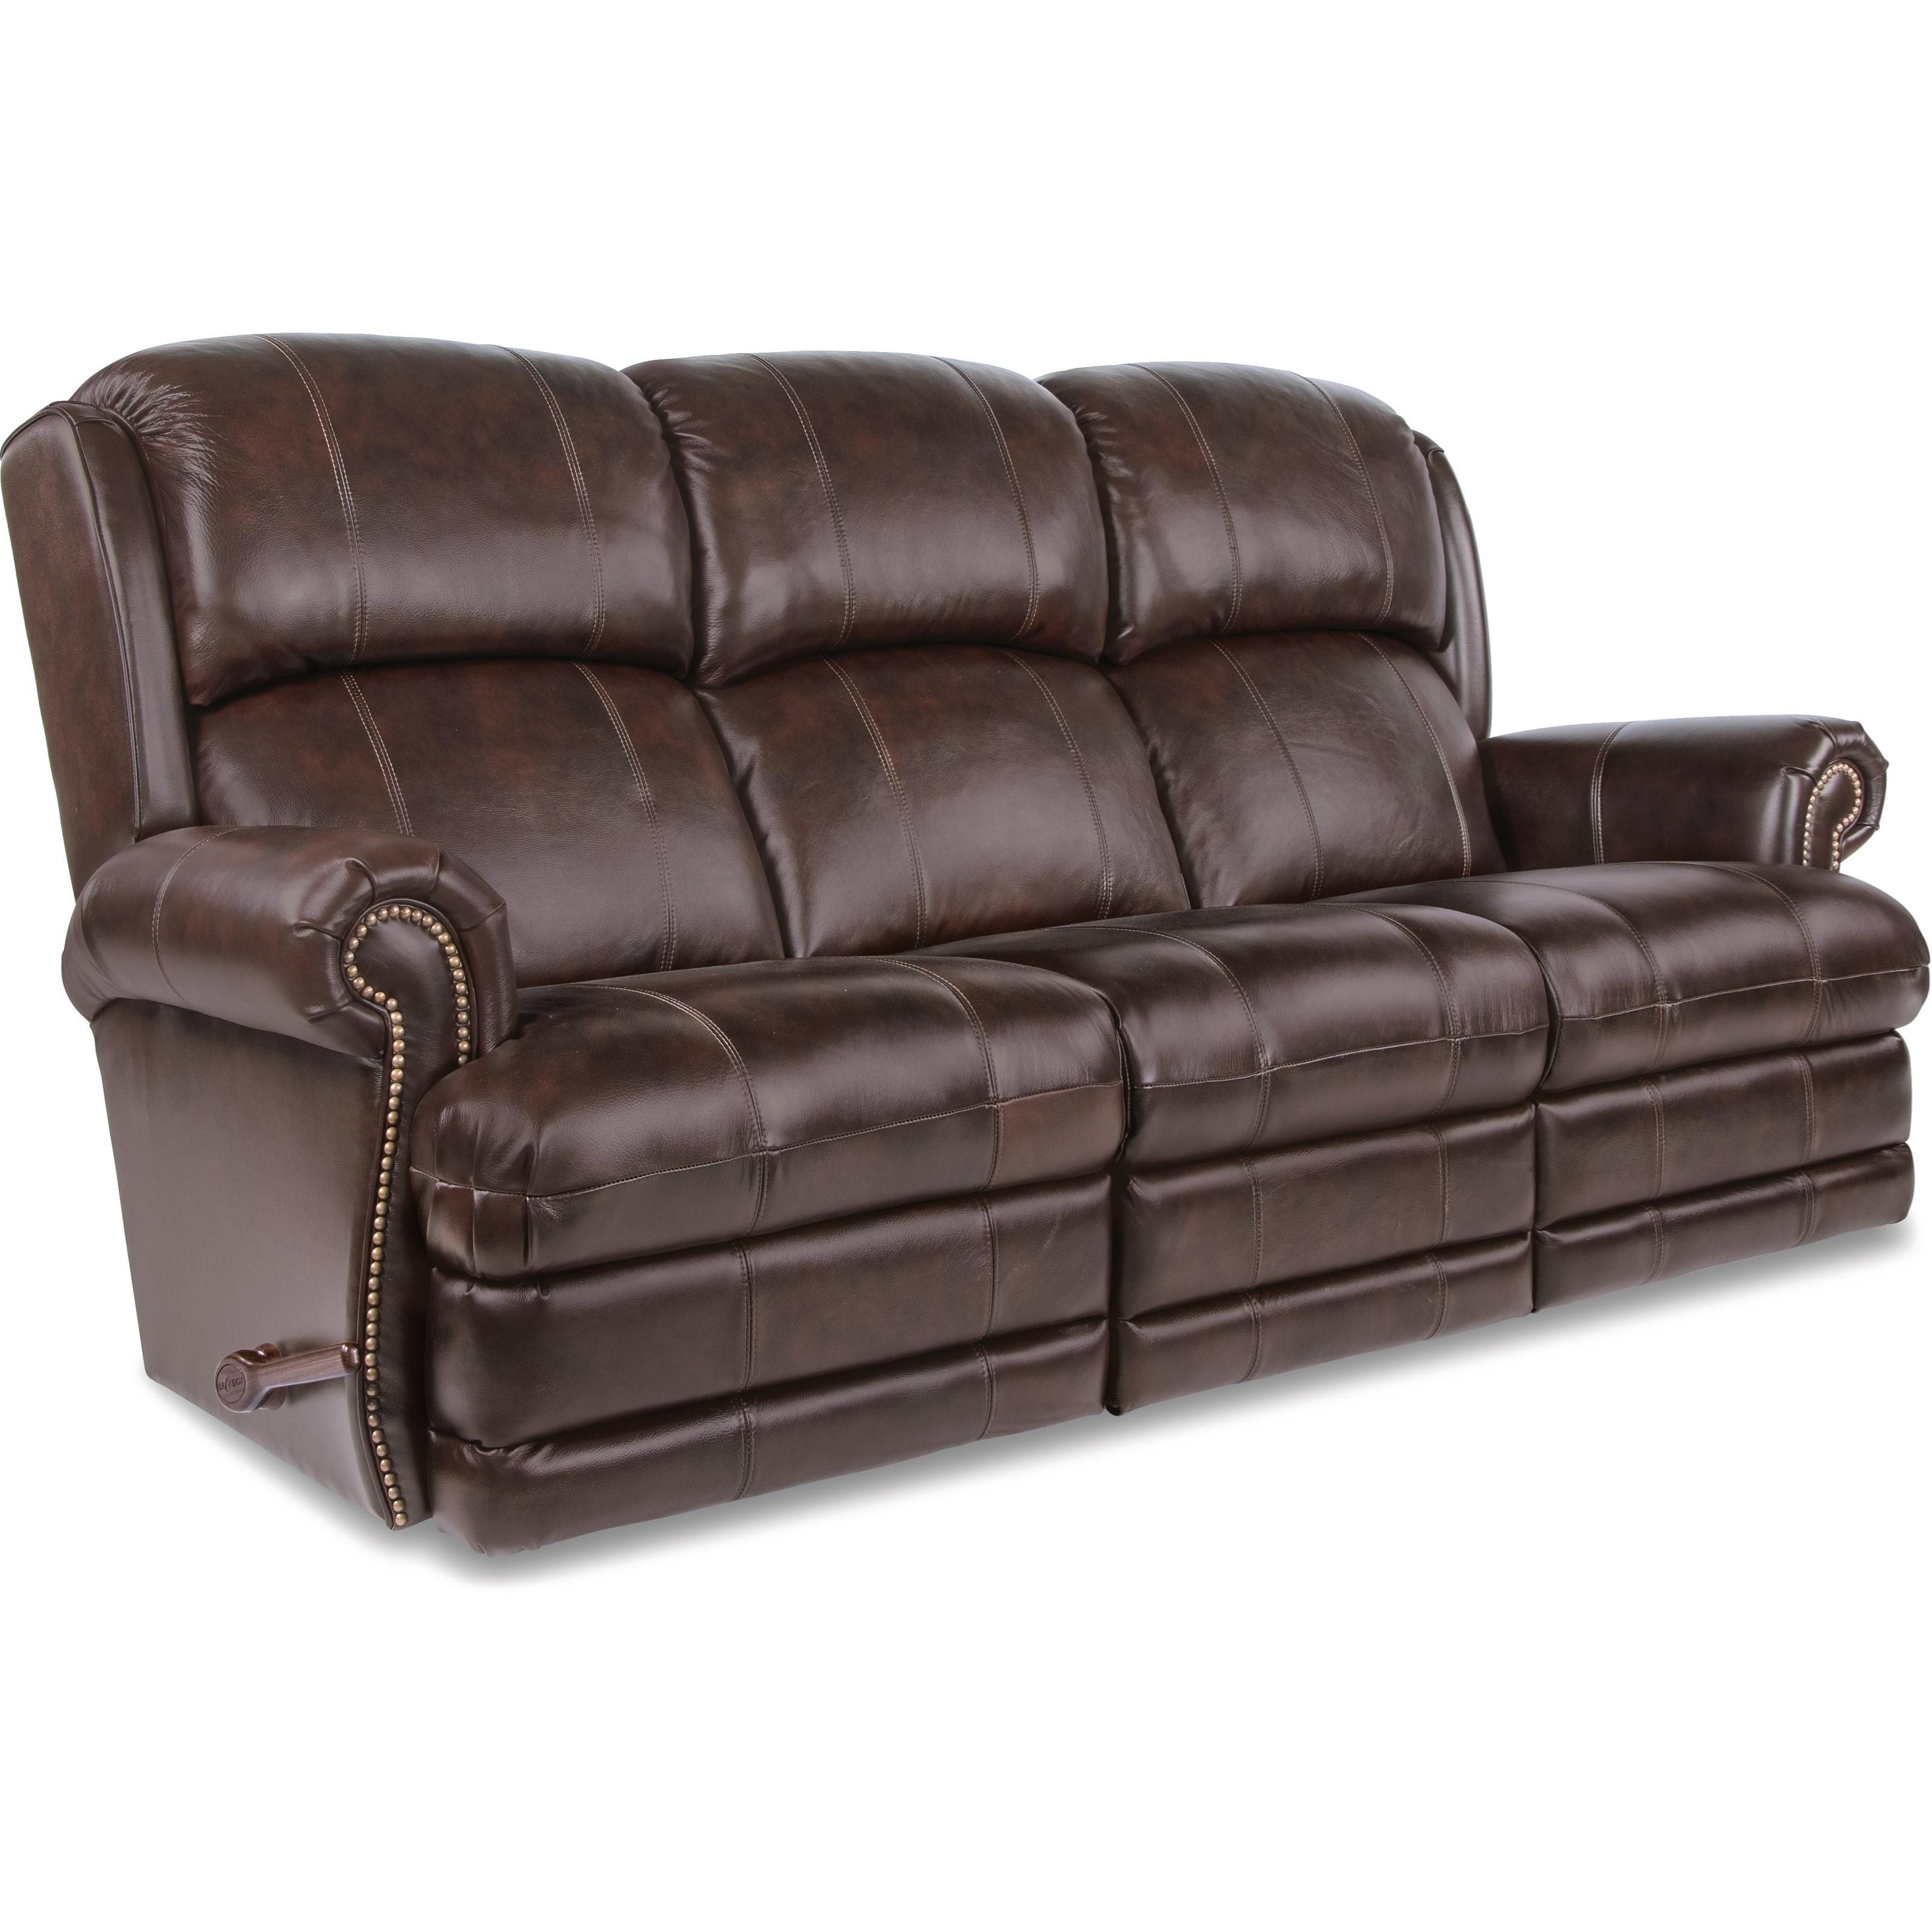 Lazy Boy Leather Sofas For Sale: La-Z-Boy Kirkwood Traditional Space Saver Reclining Sofa